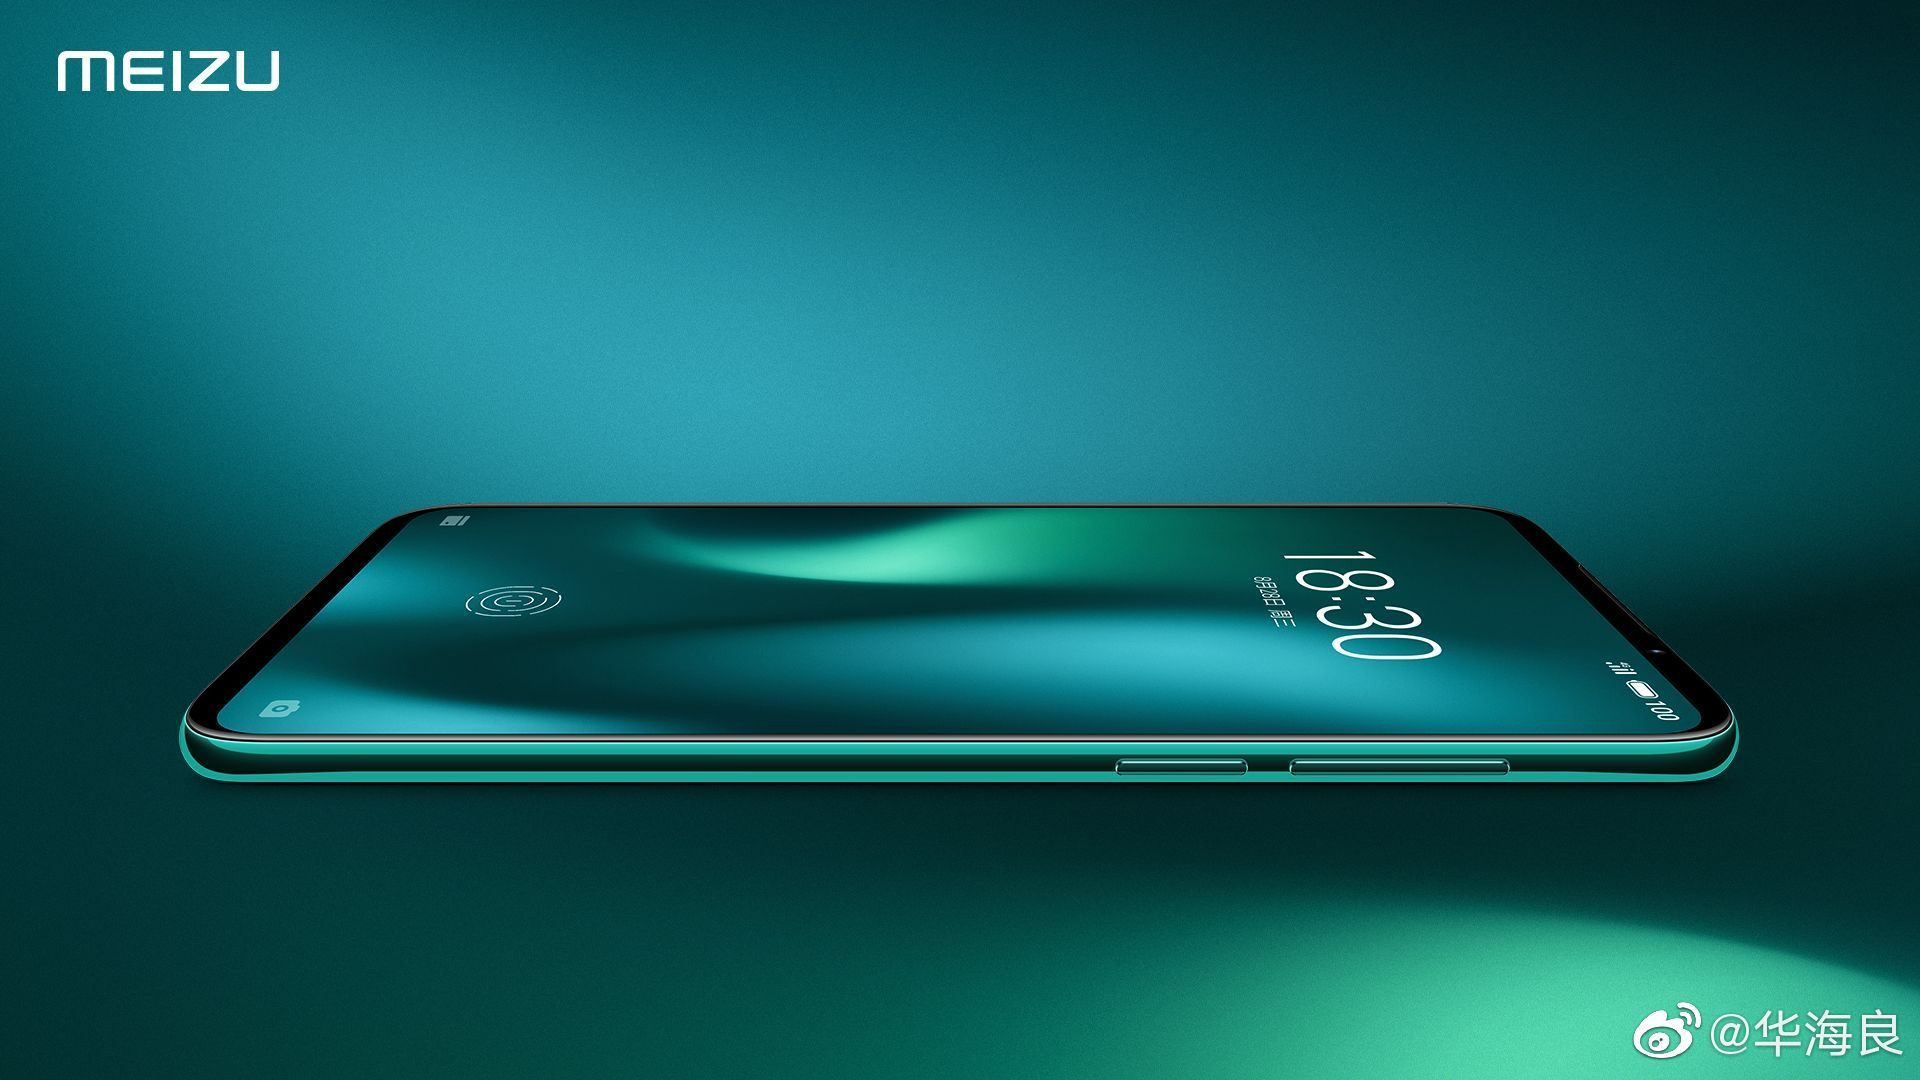 Meizu 16s Proのカラーバリエーションにグリーンを用意